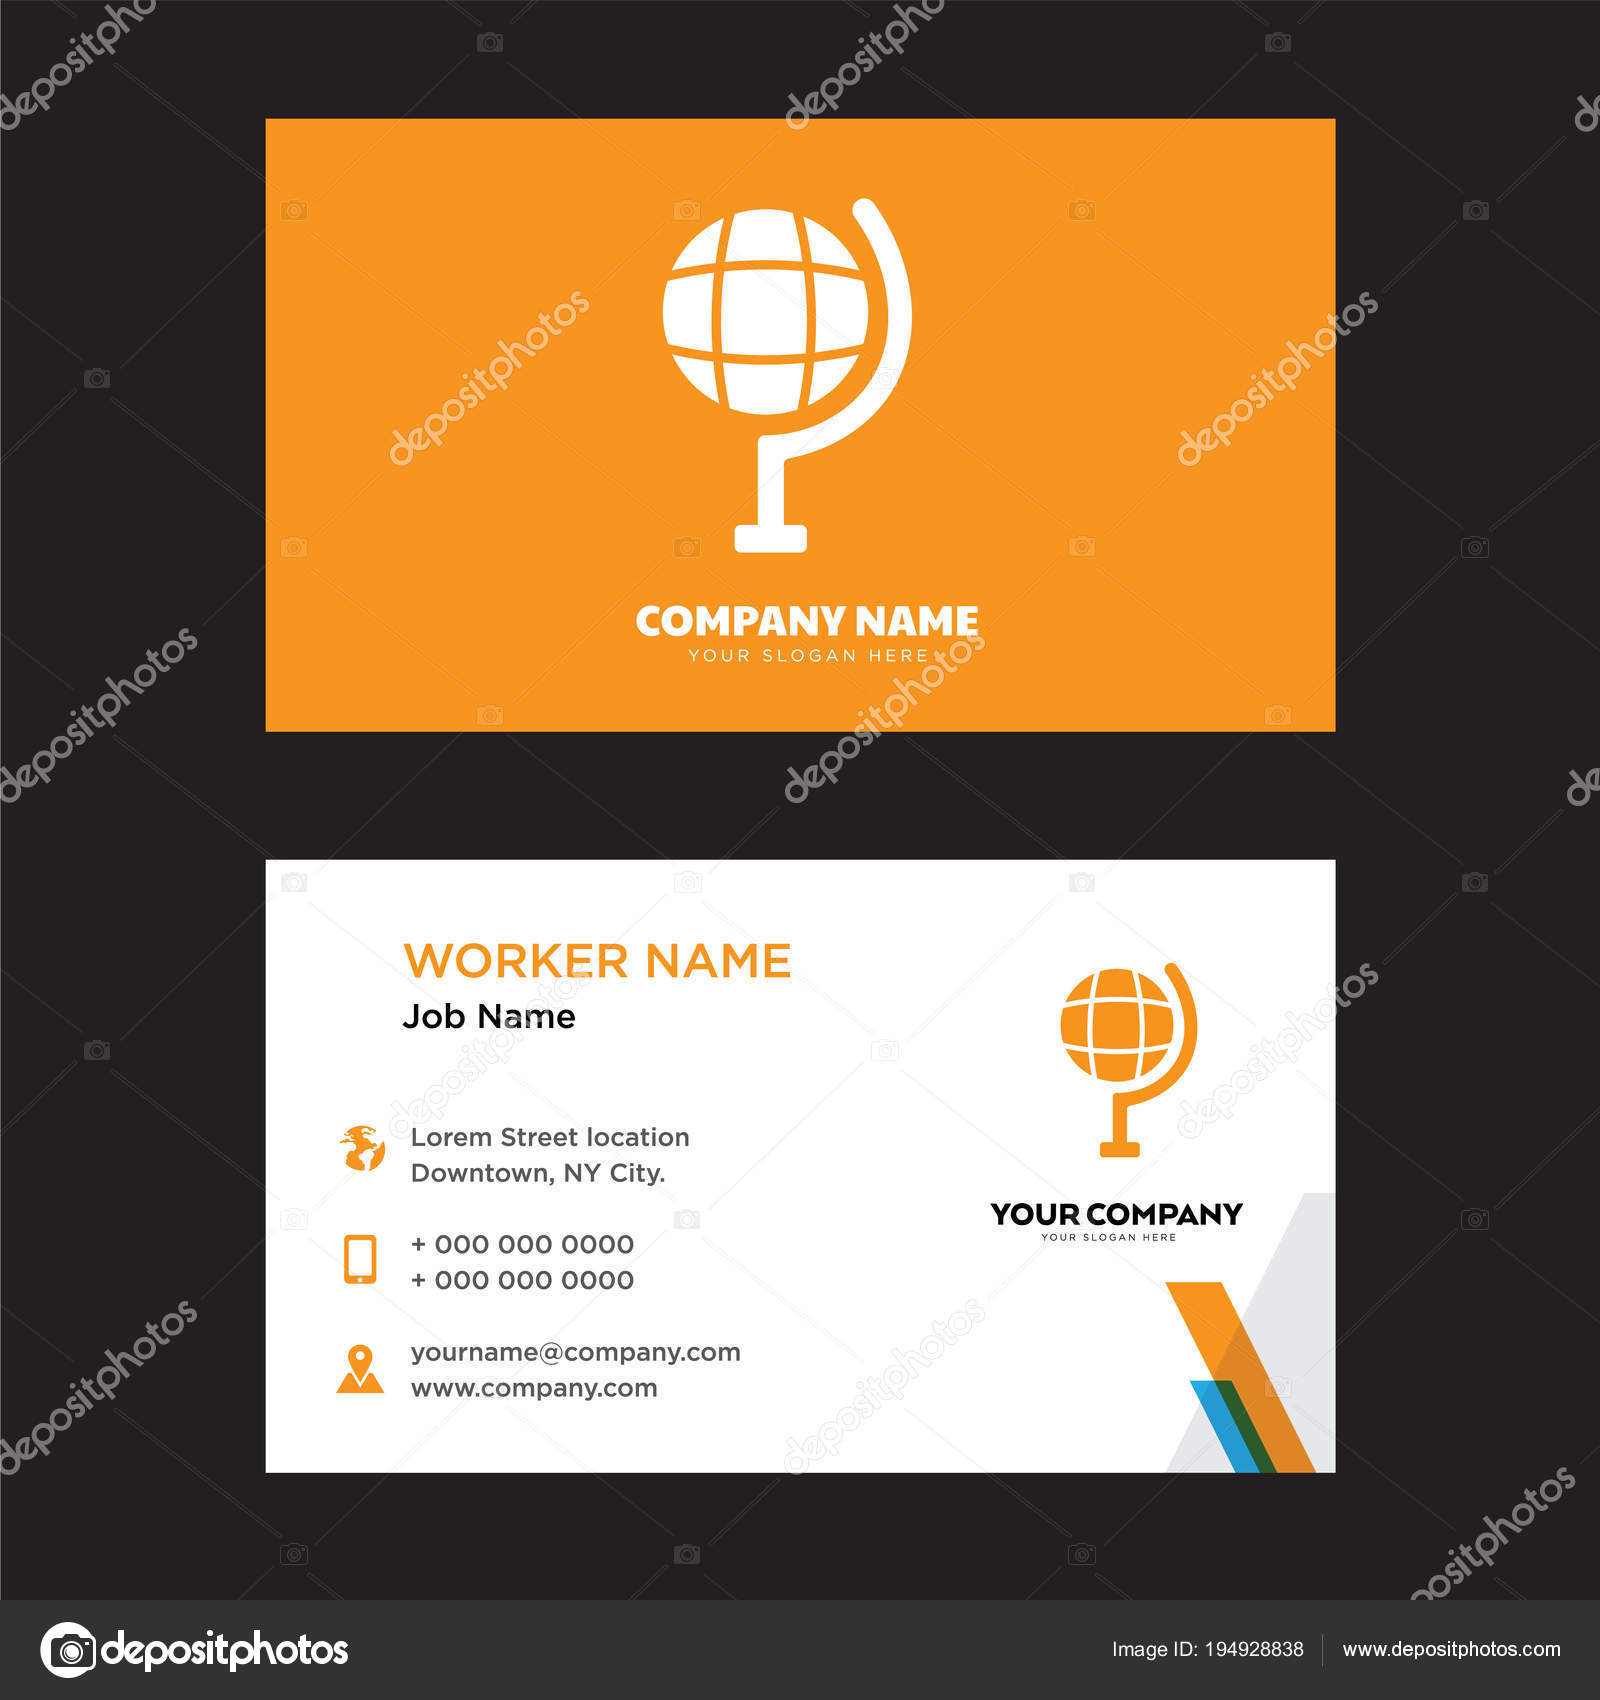 Earth globe business card design vetores de stock vectorbest earth globe business card design vetores de stock reheart Images